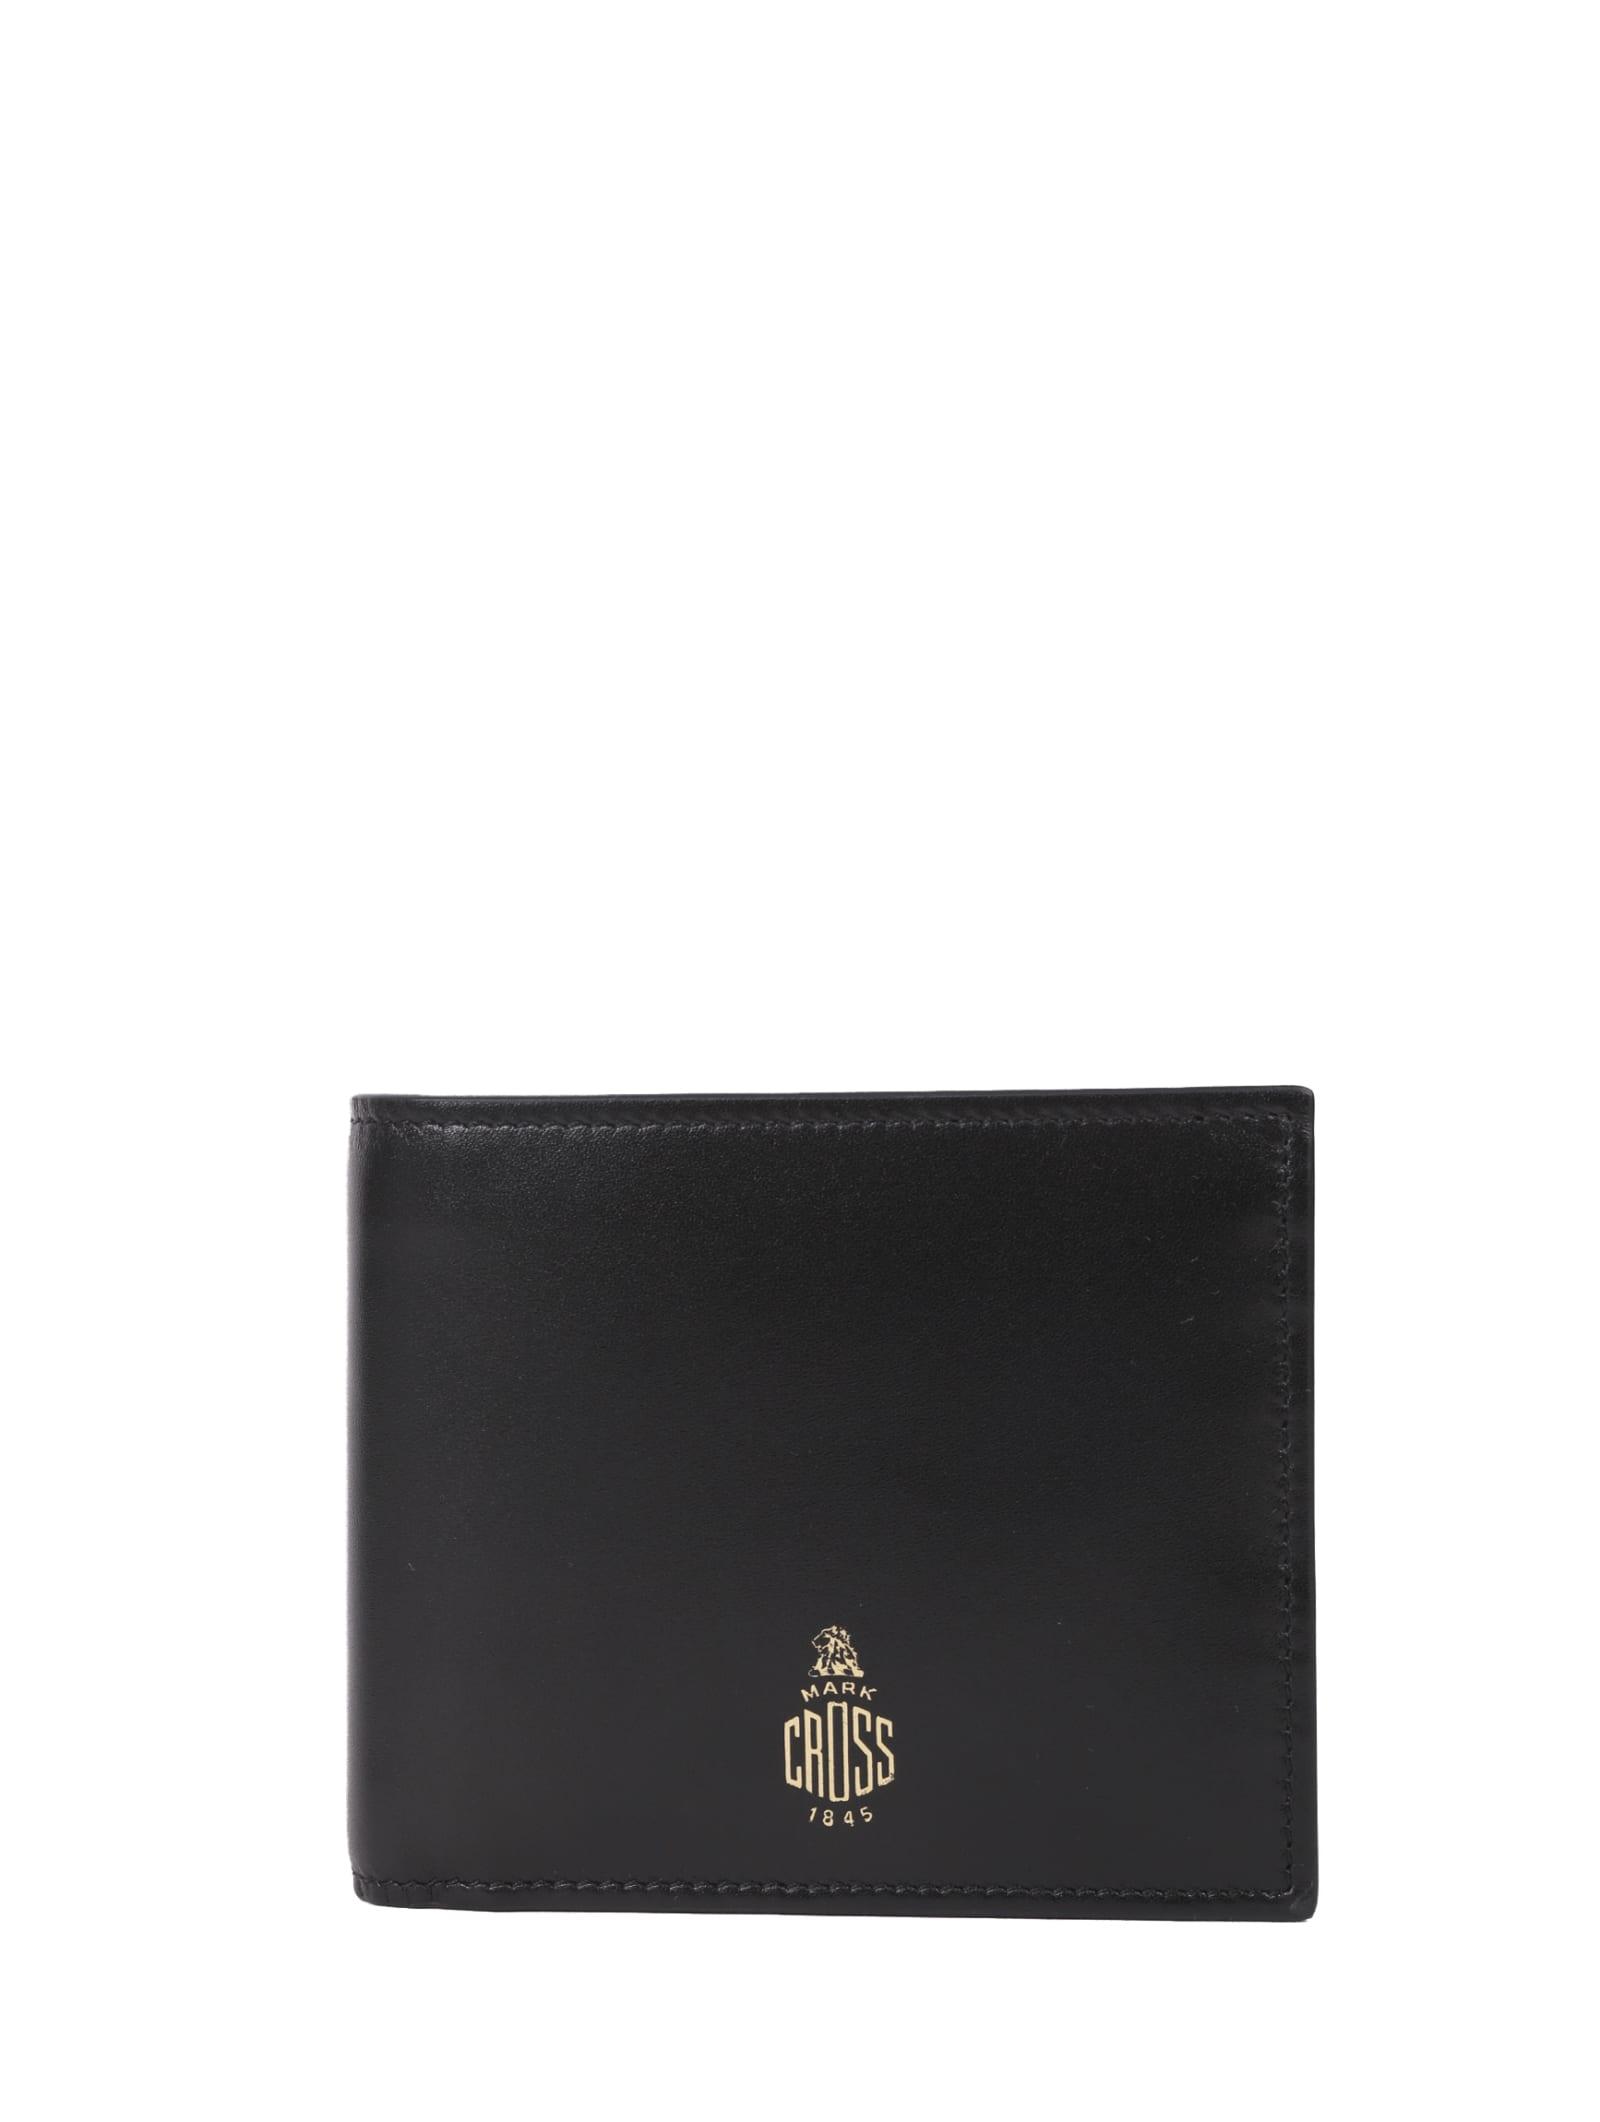 Mark Cross Black Wallet